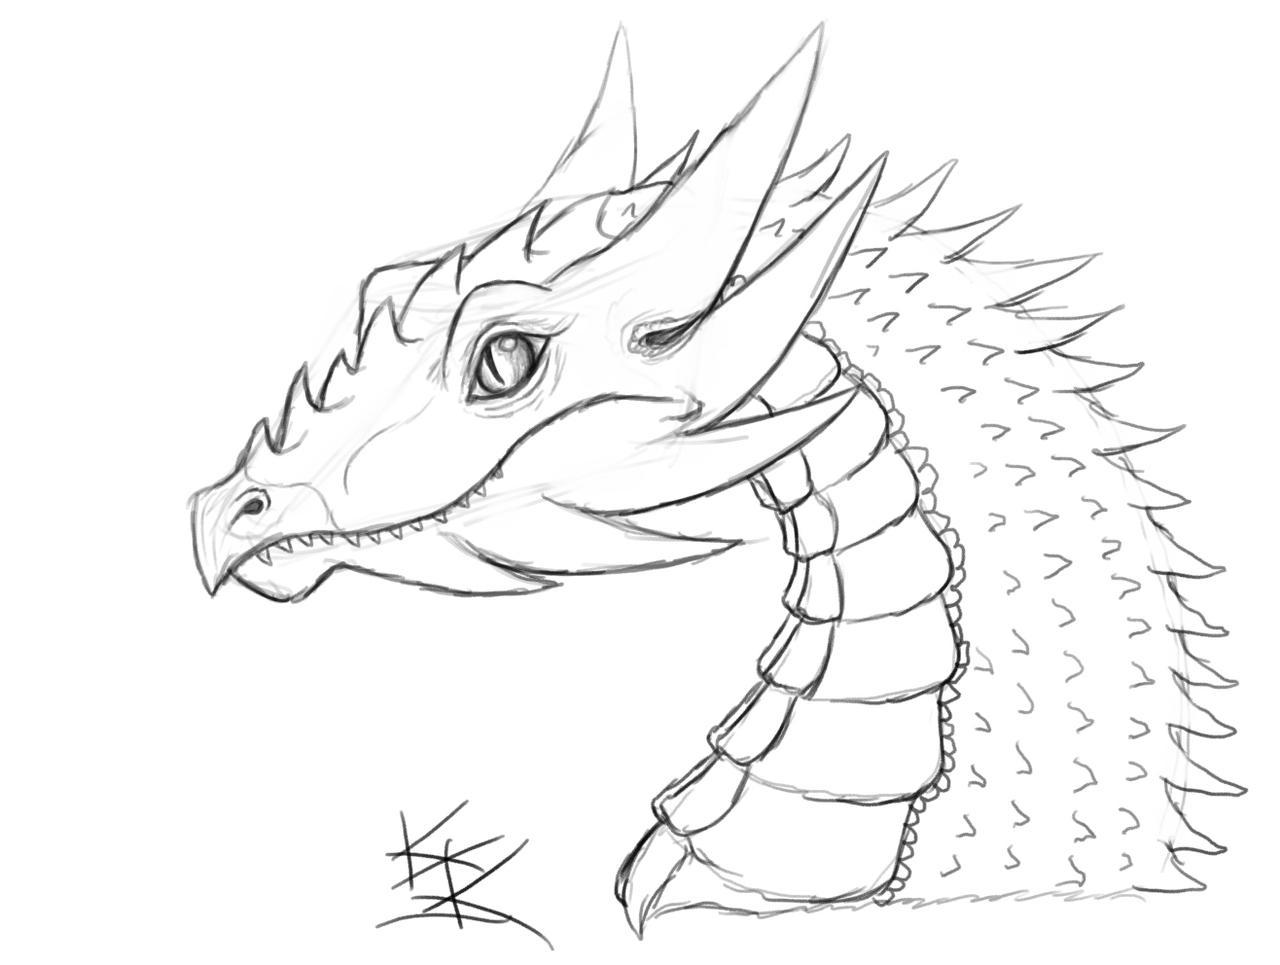 dibujo de dragones: